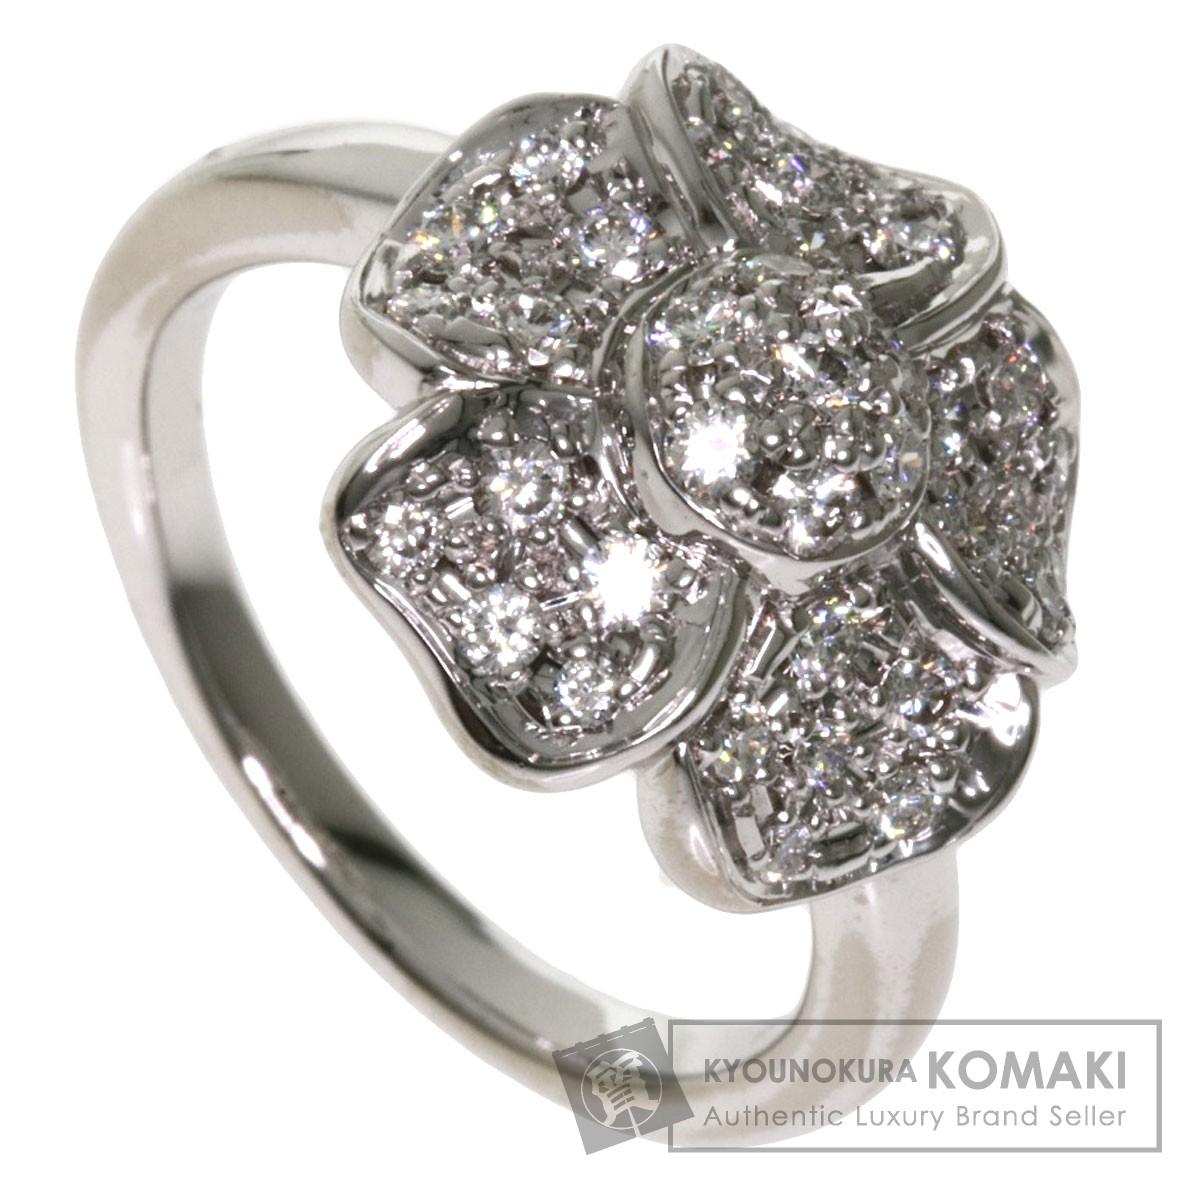 0.57ct ダイヤモンド リング・指輪 K18ホワイトゴールド 8g レディース 【中古】